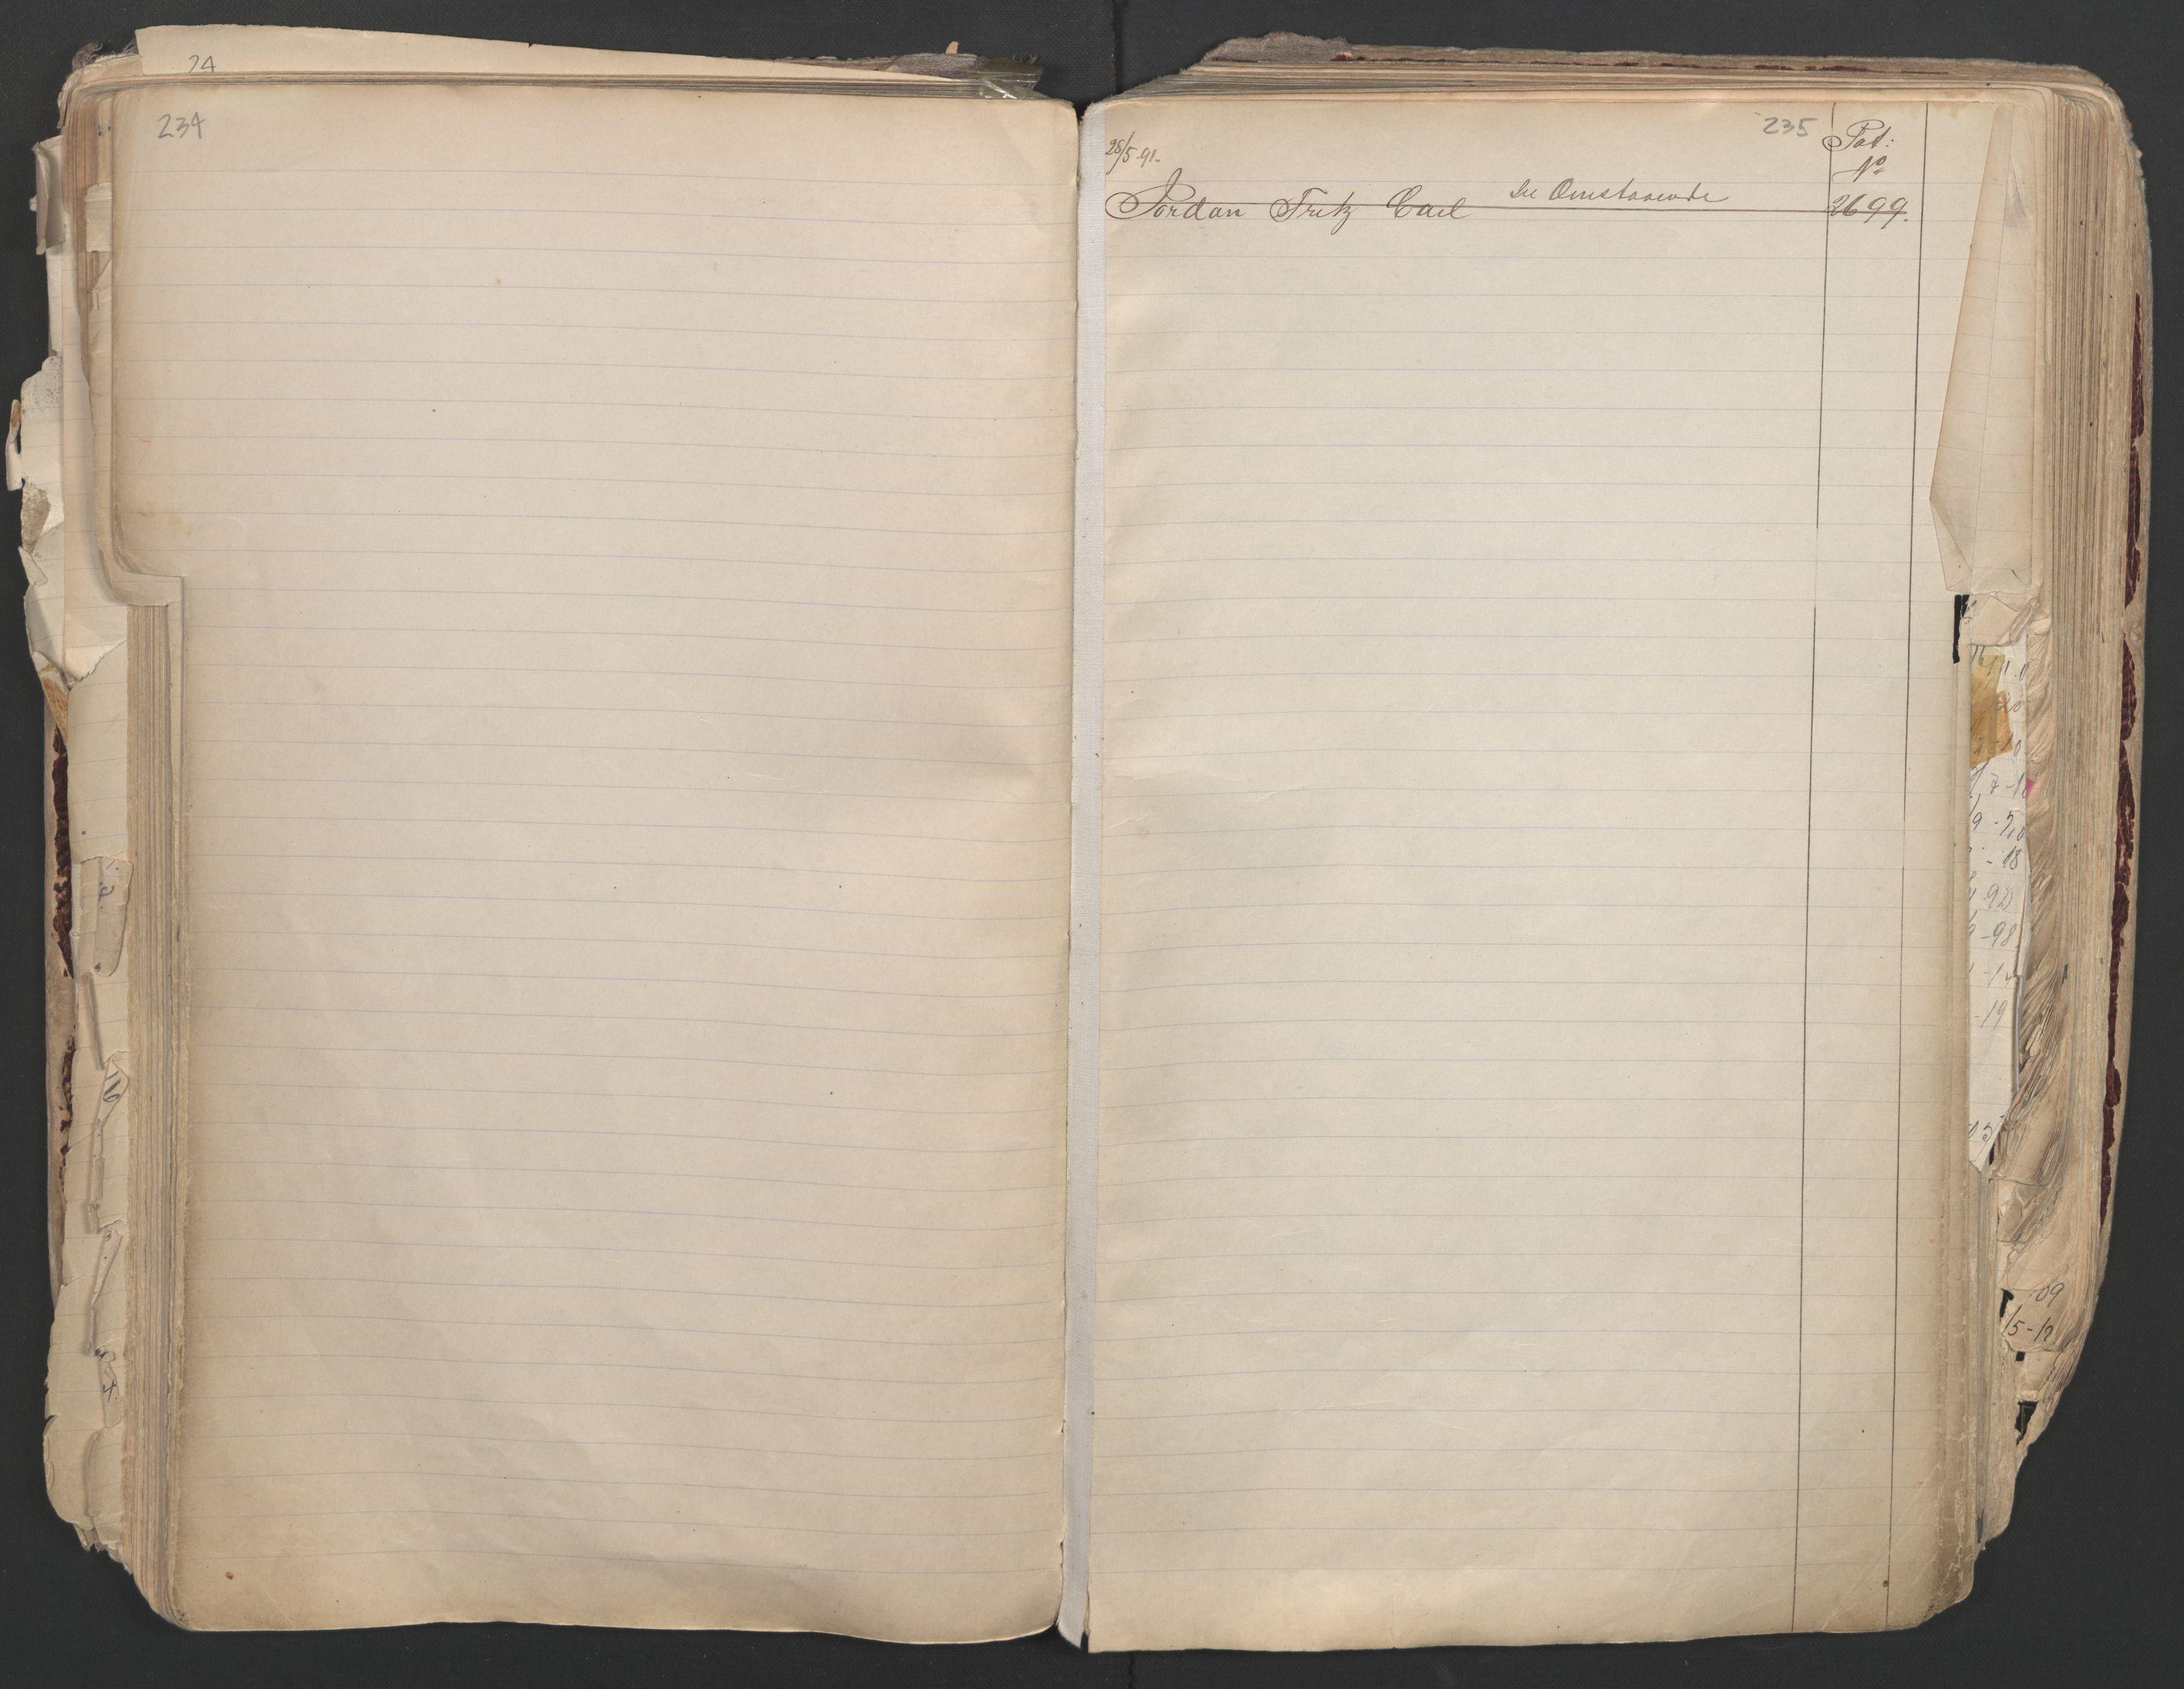 SAO, Oslo sjømannskontor, F/Fa/L0003: Register for Oslo mønstringskrets, 1891-1948, s. 234-235